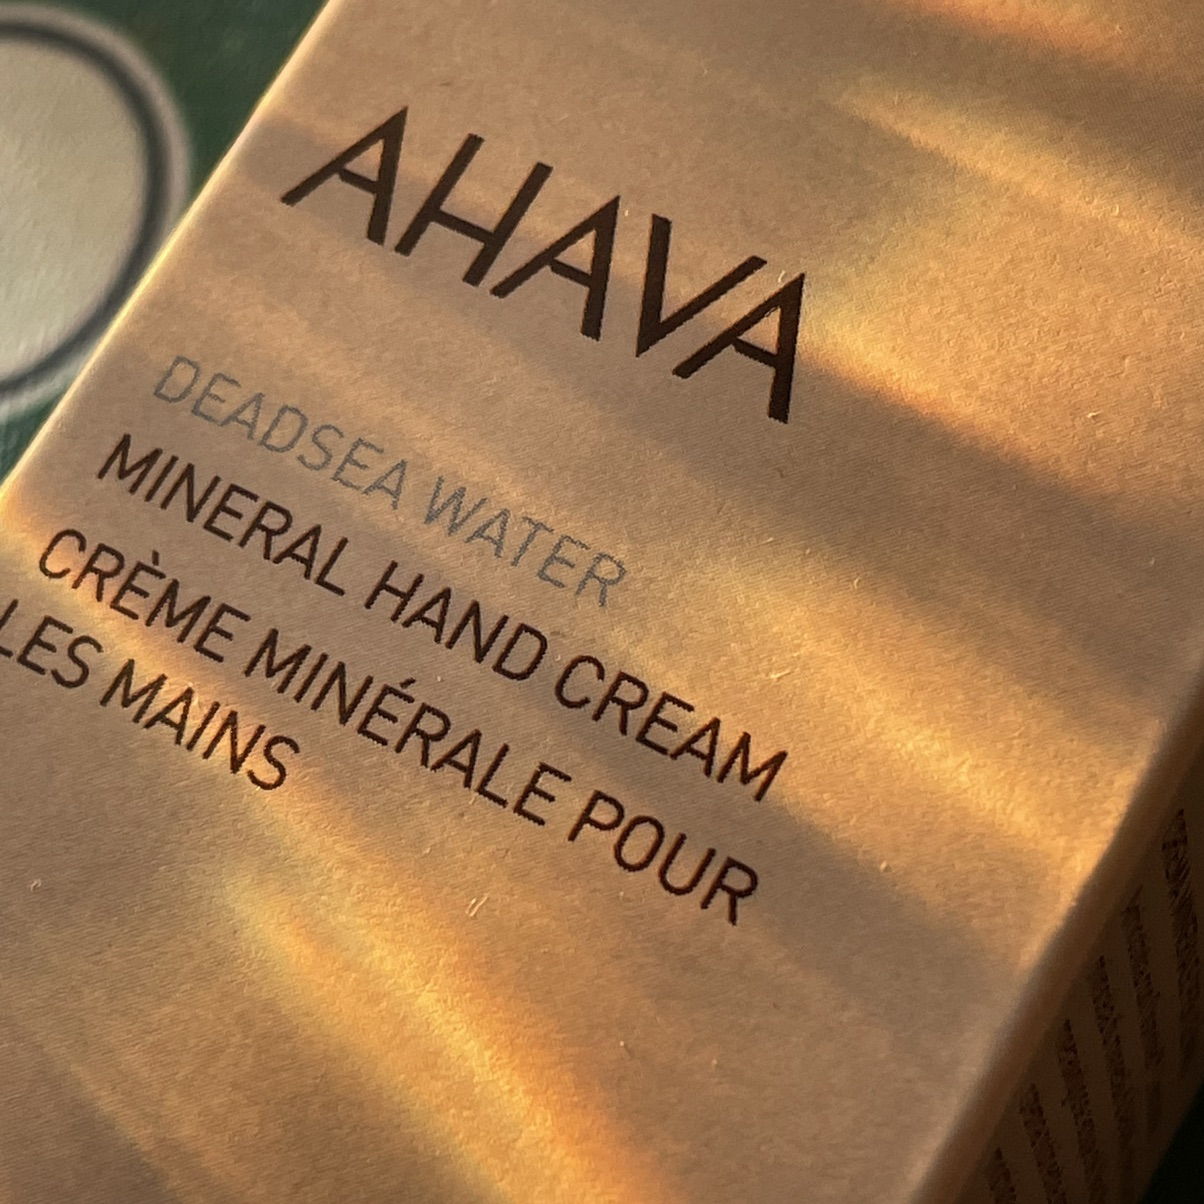 AHAVA护手霜